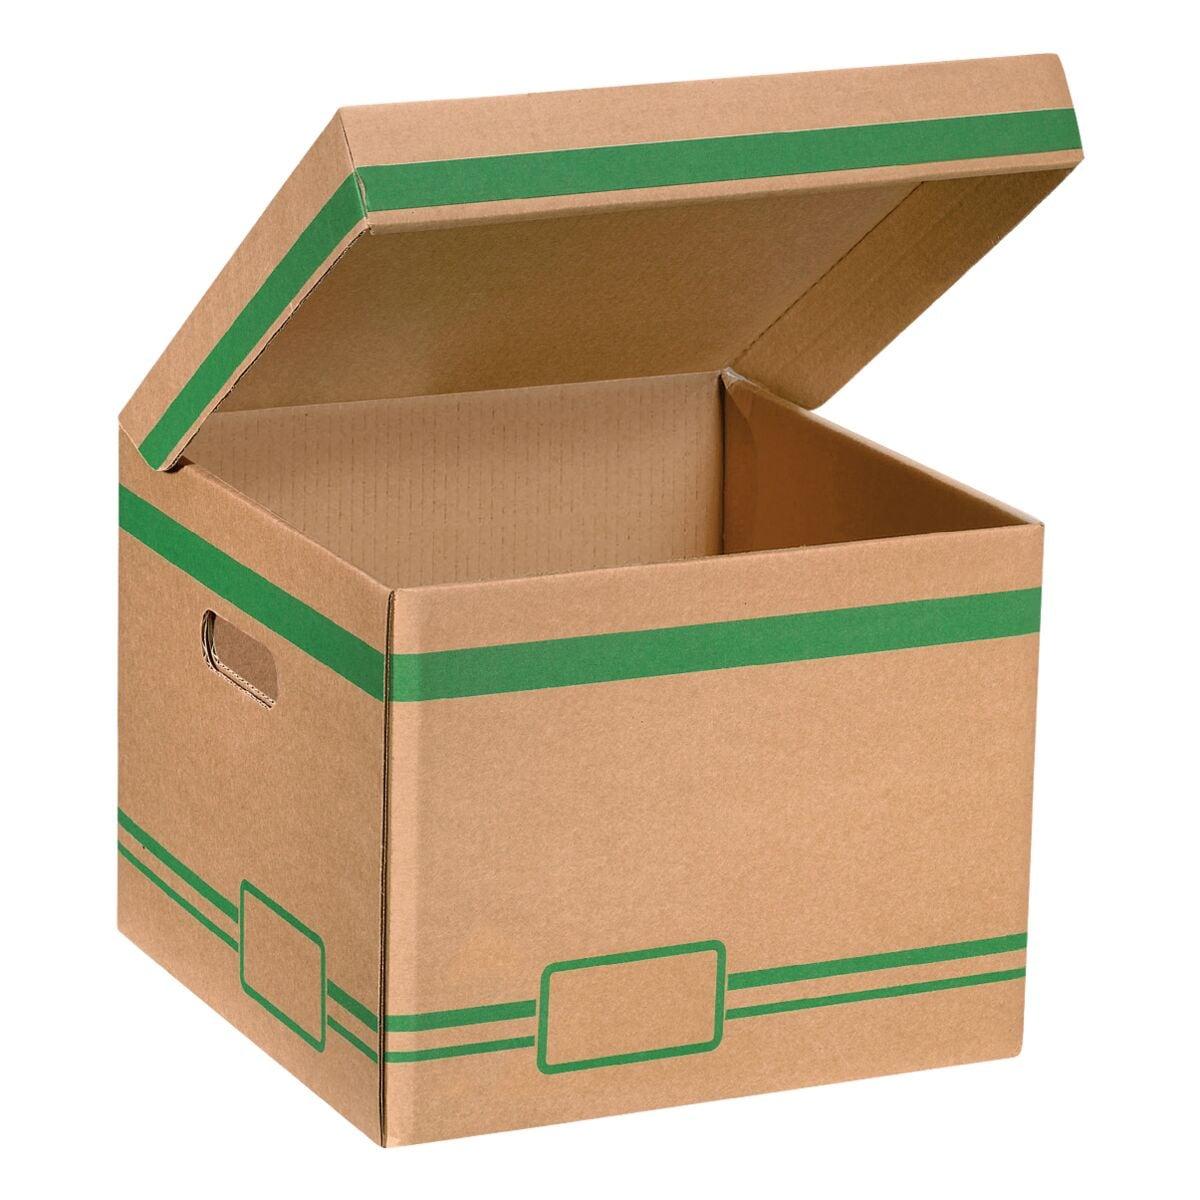 cartonia klappdeckel container mini bei otto office g nstig kaufen. Black Bedroom Furniture Sets. Home Design Ideas